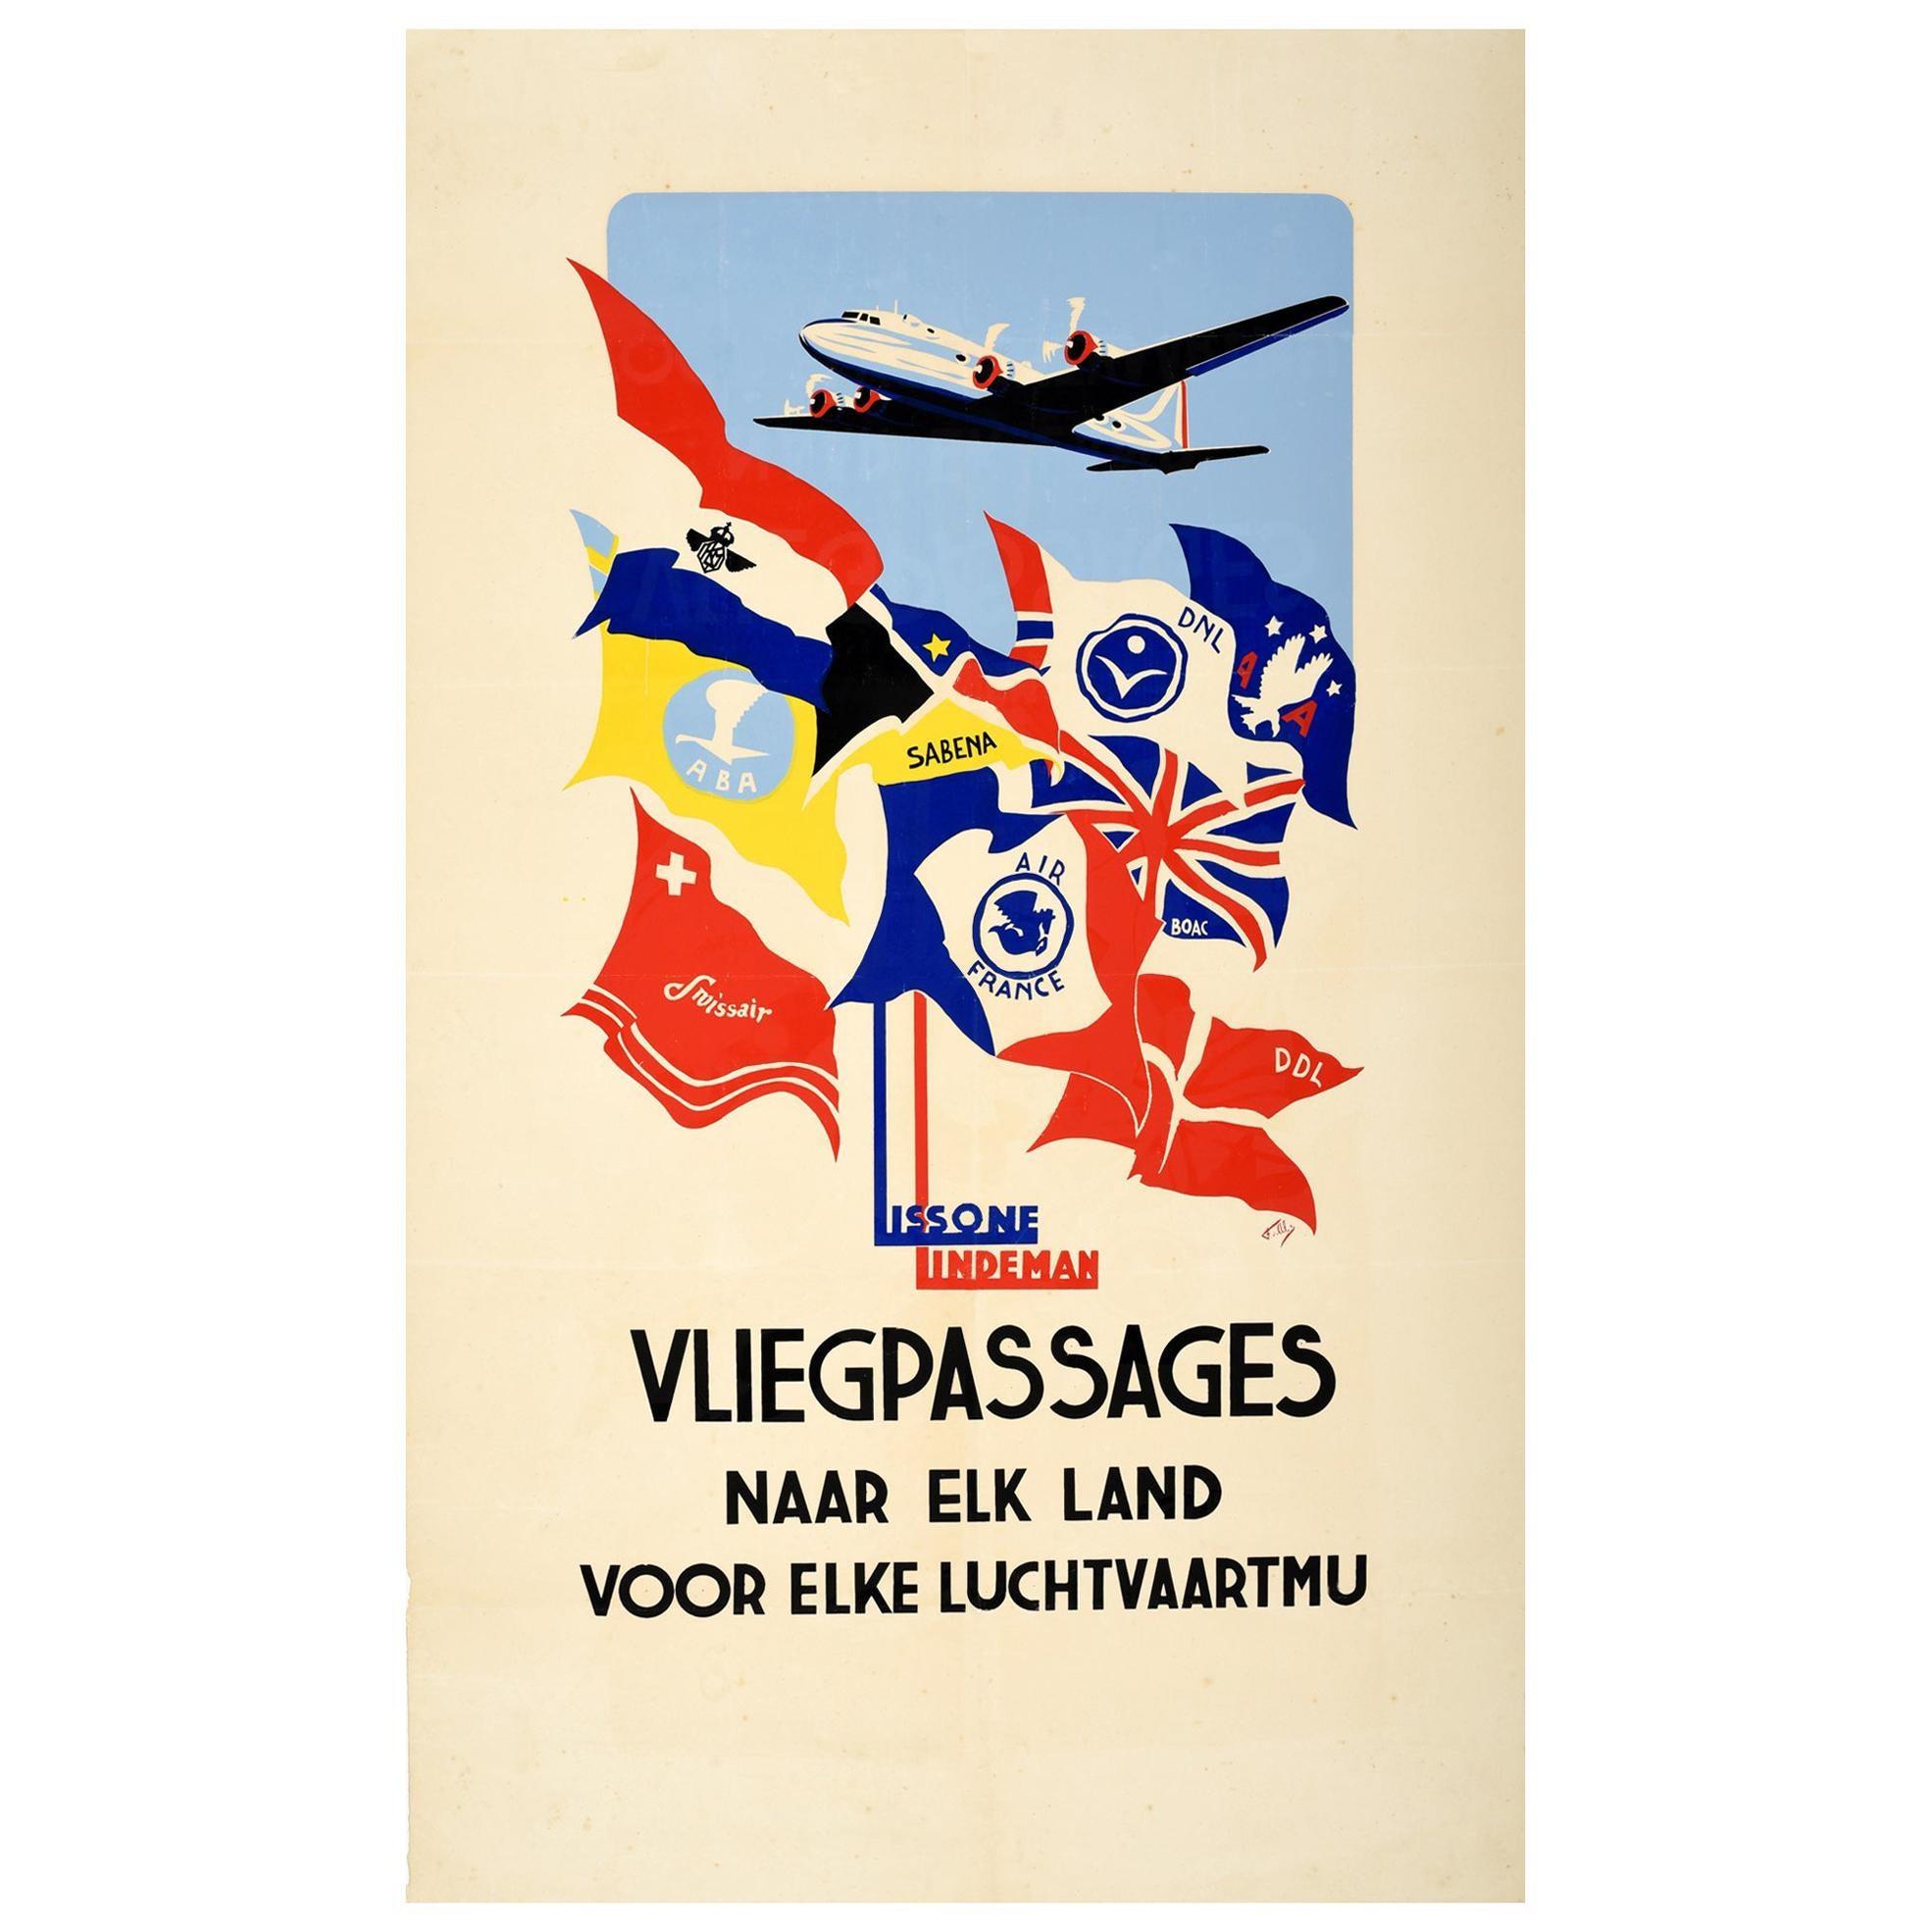 Original Vintage Poster Lissone Lindeman Vliegpassages Airline Travel Aviation